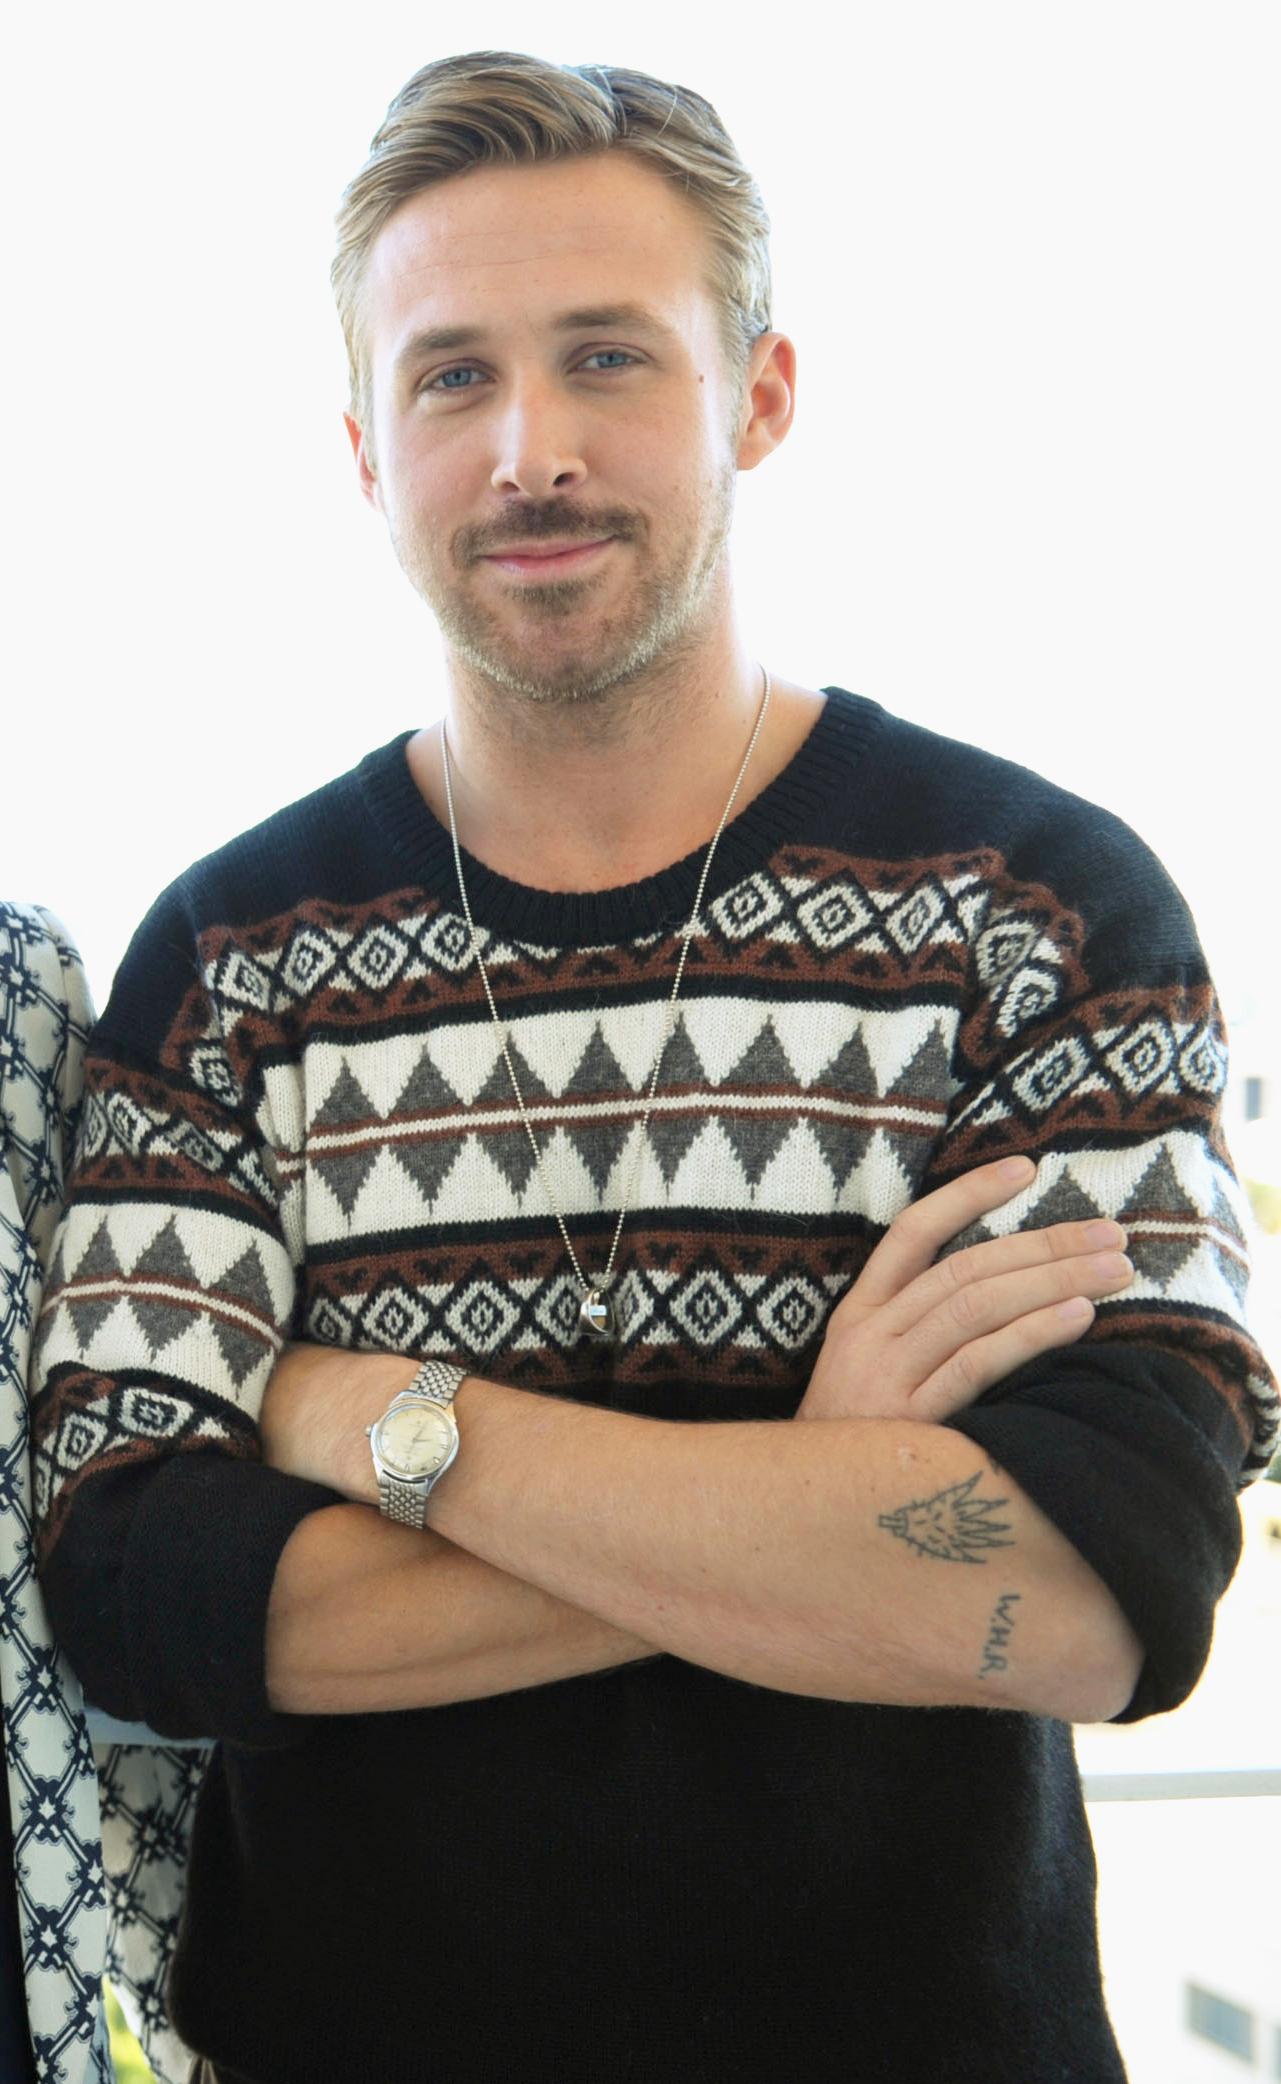 Ryan Gosling Bradley Cooper beard